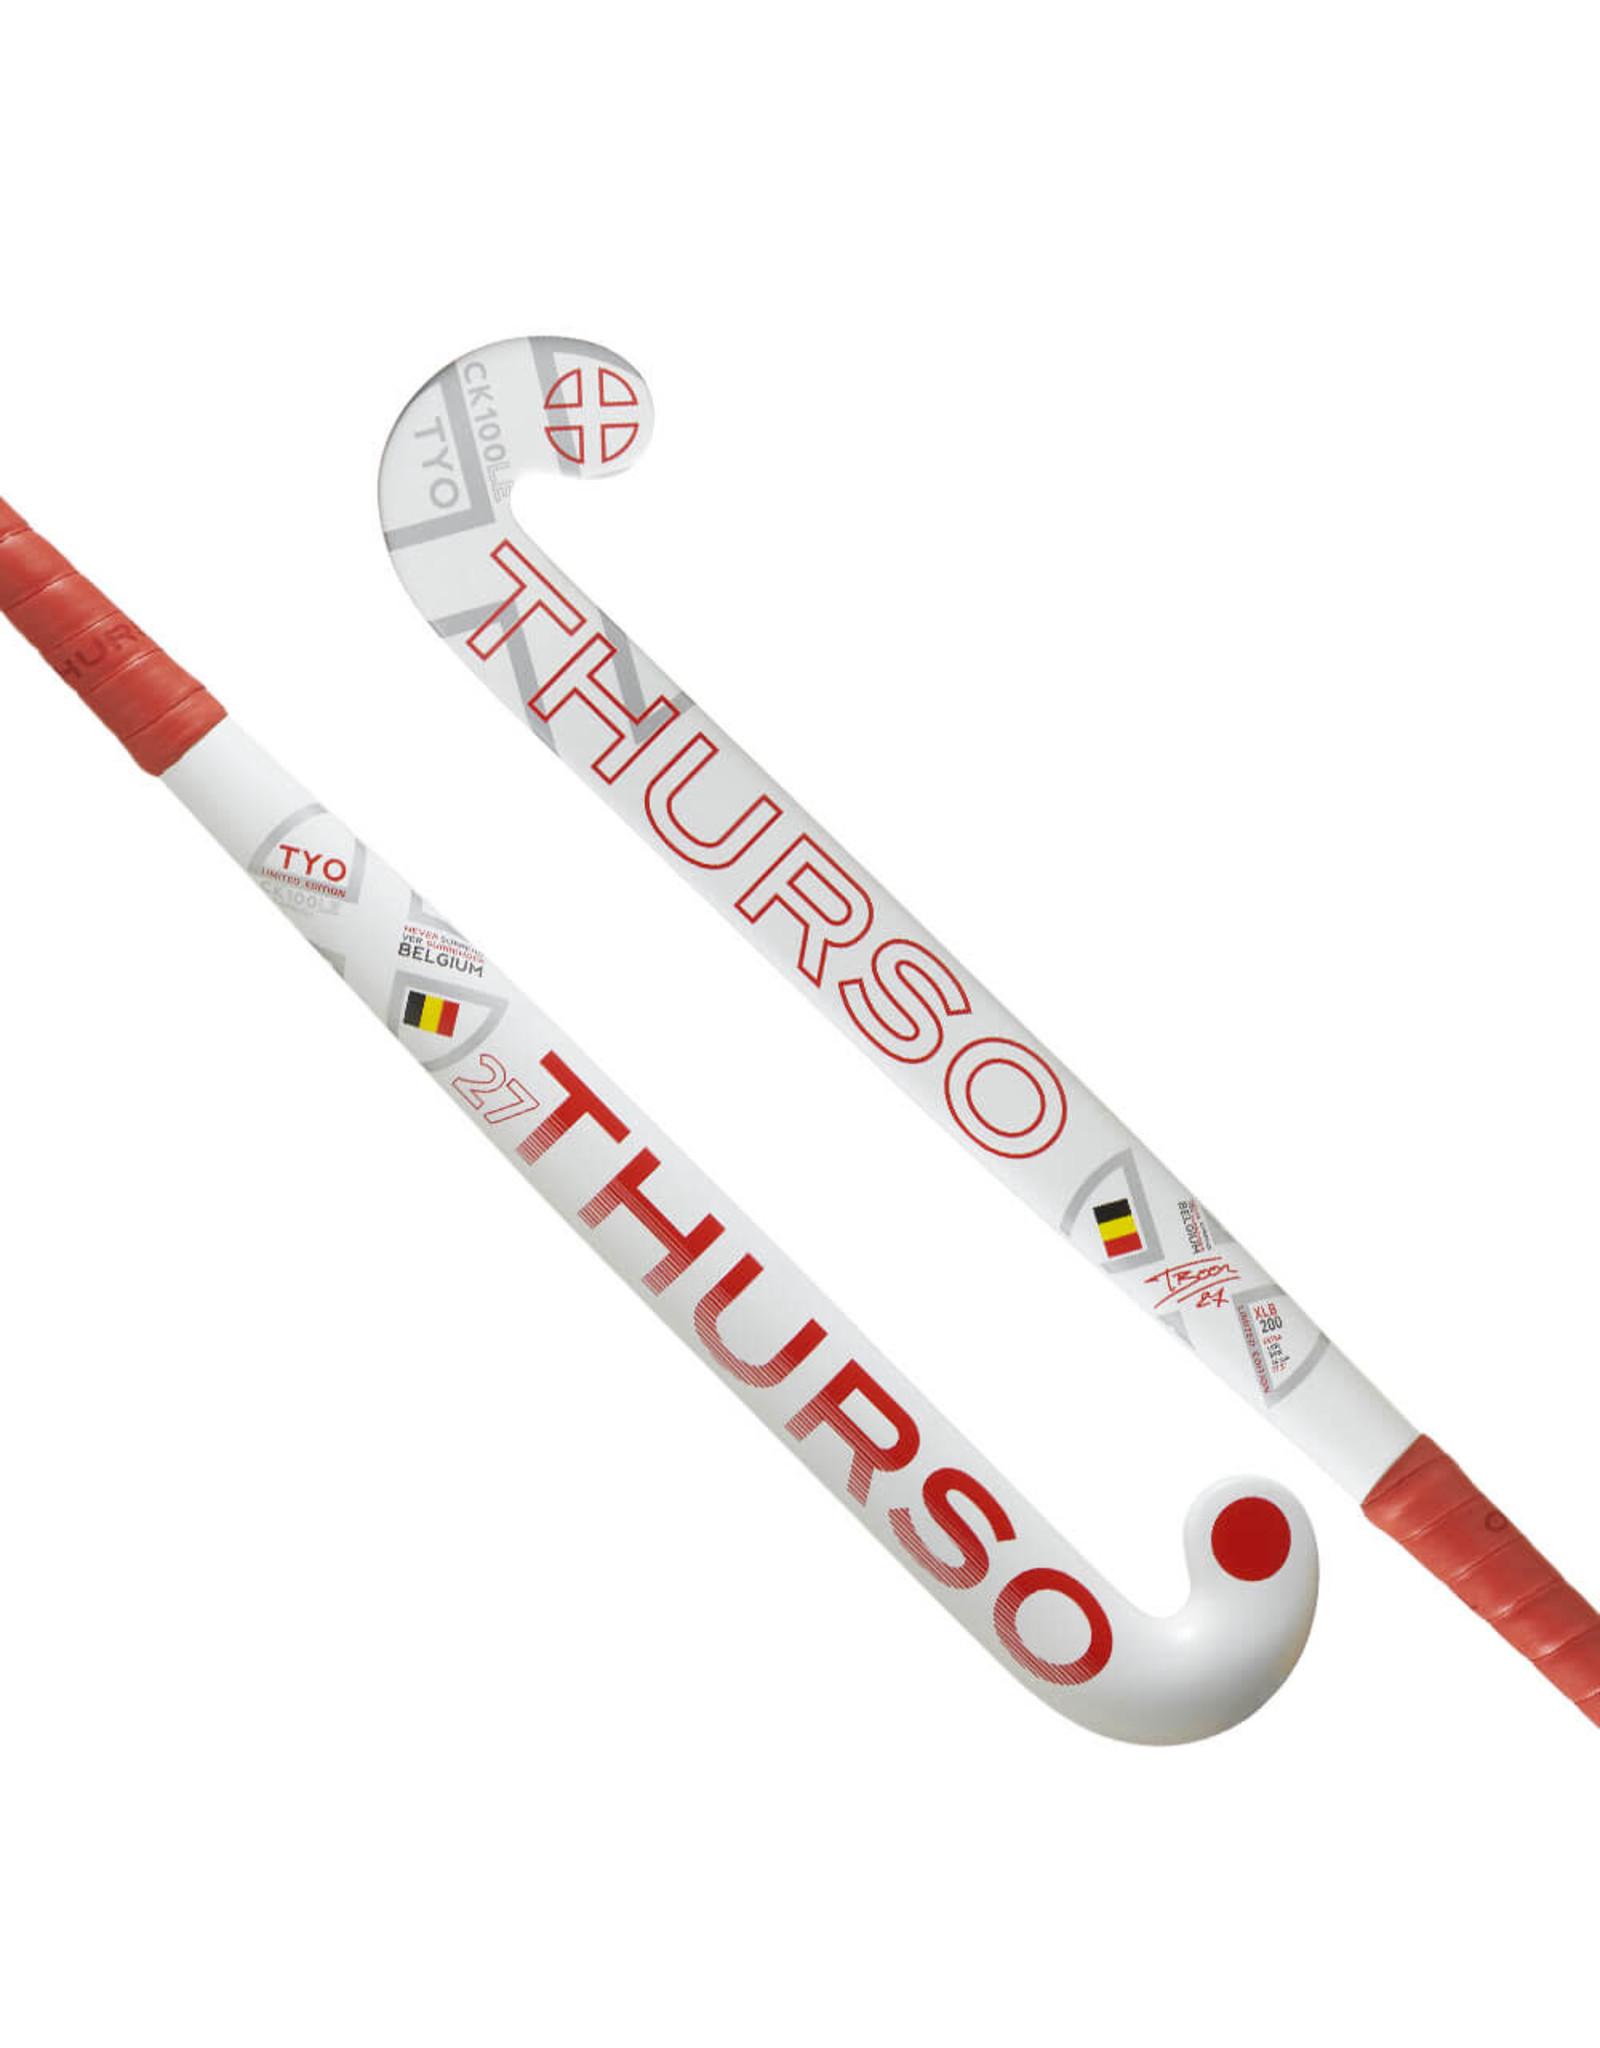 THURSO THRUSO TOKYO CK 100 LB 20-21 STICK